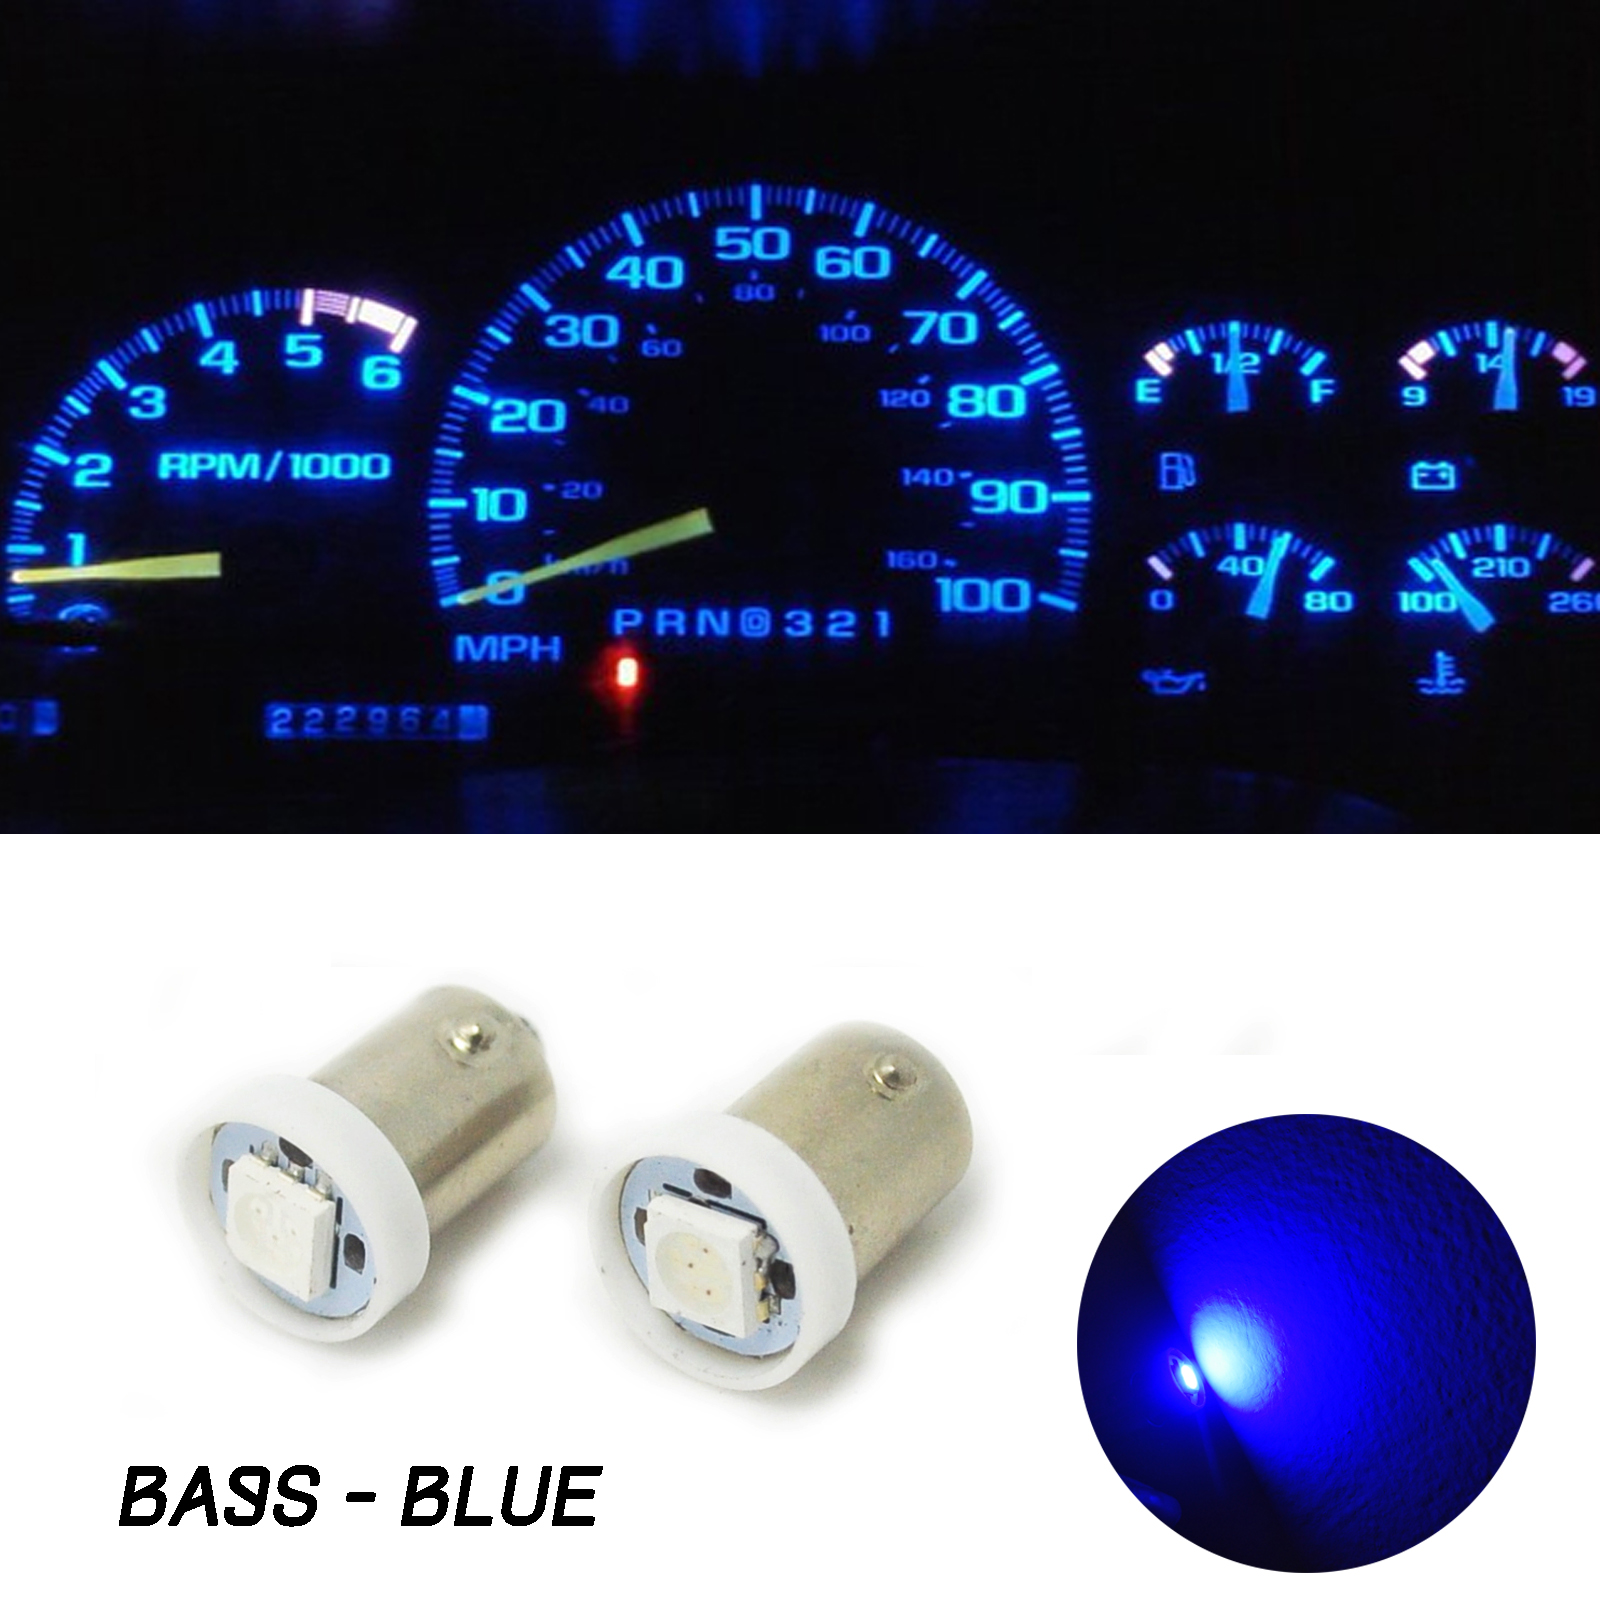 10pcs BA9S 5050 SMD Car LED Dashboard Light Gauge Cluster Bulbs H6W H21W Q65B T4W M8617 jewellery